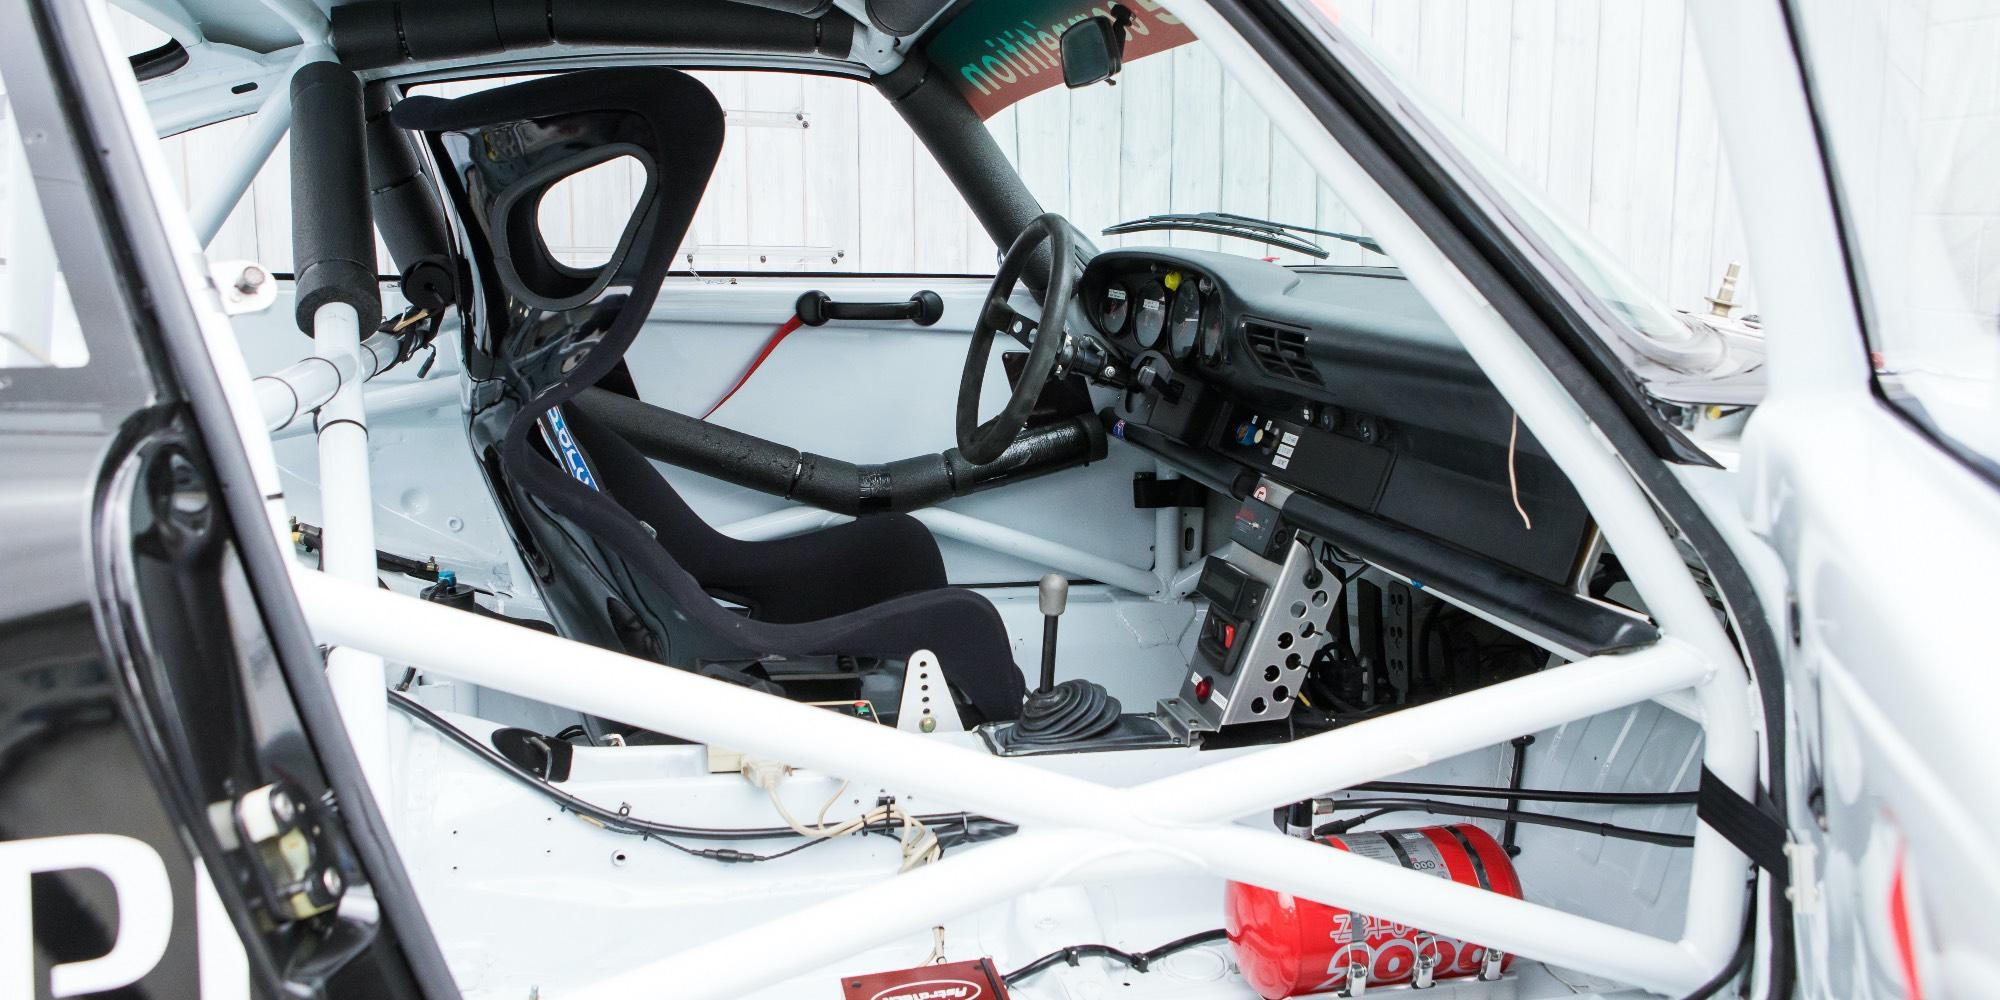 The Ex – Larbre Competition, Sony PlayStation, Multiple Le Mans 24 Hours 1997 Porsche 993 GT2 Evo